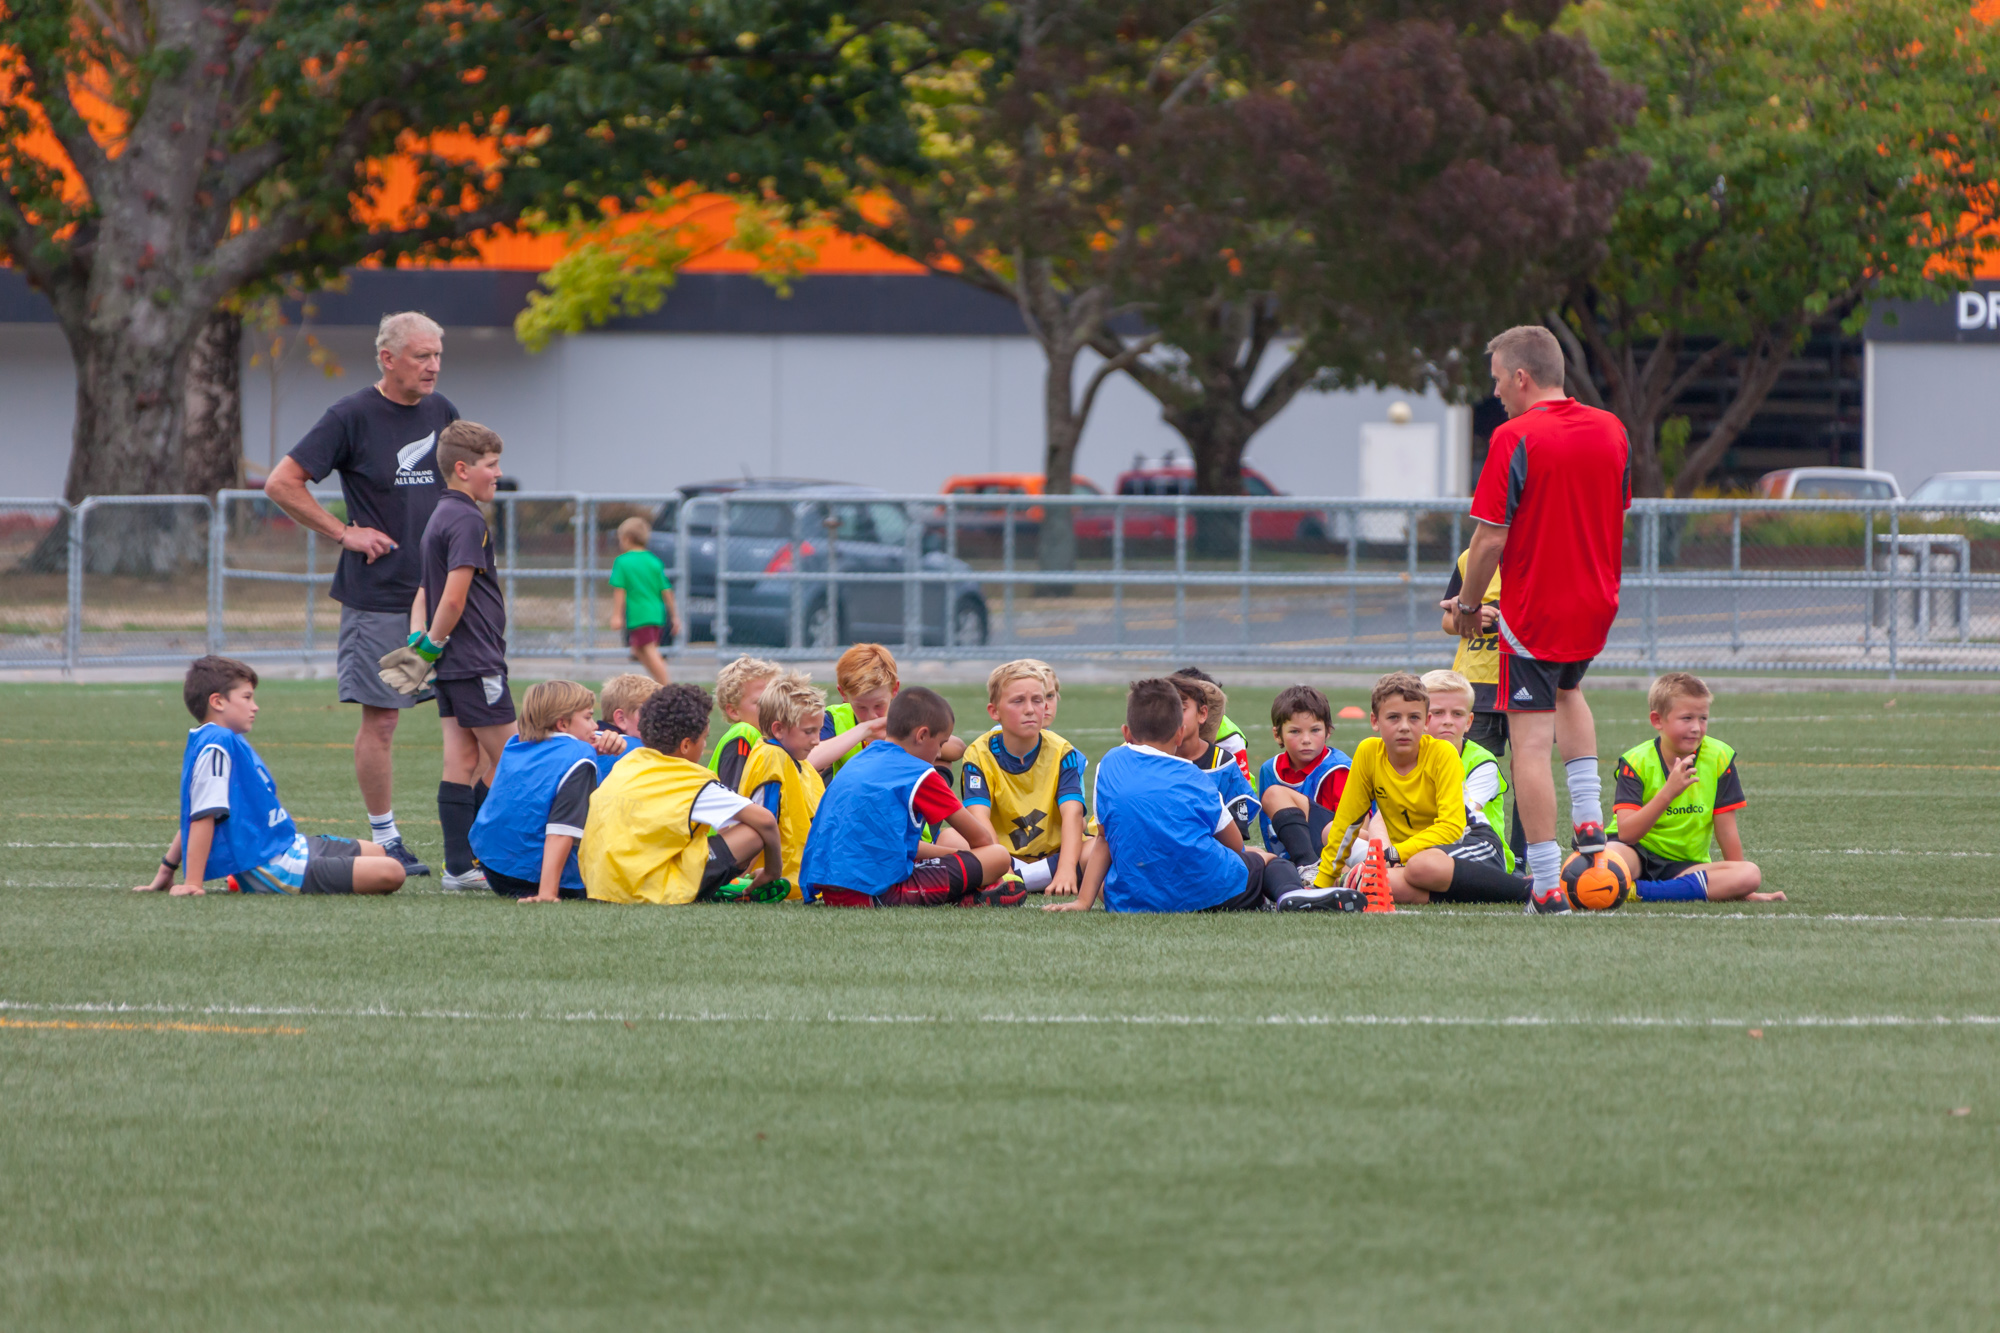 UHCC Soccer Coach 4498